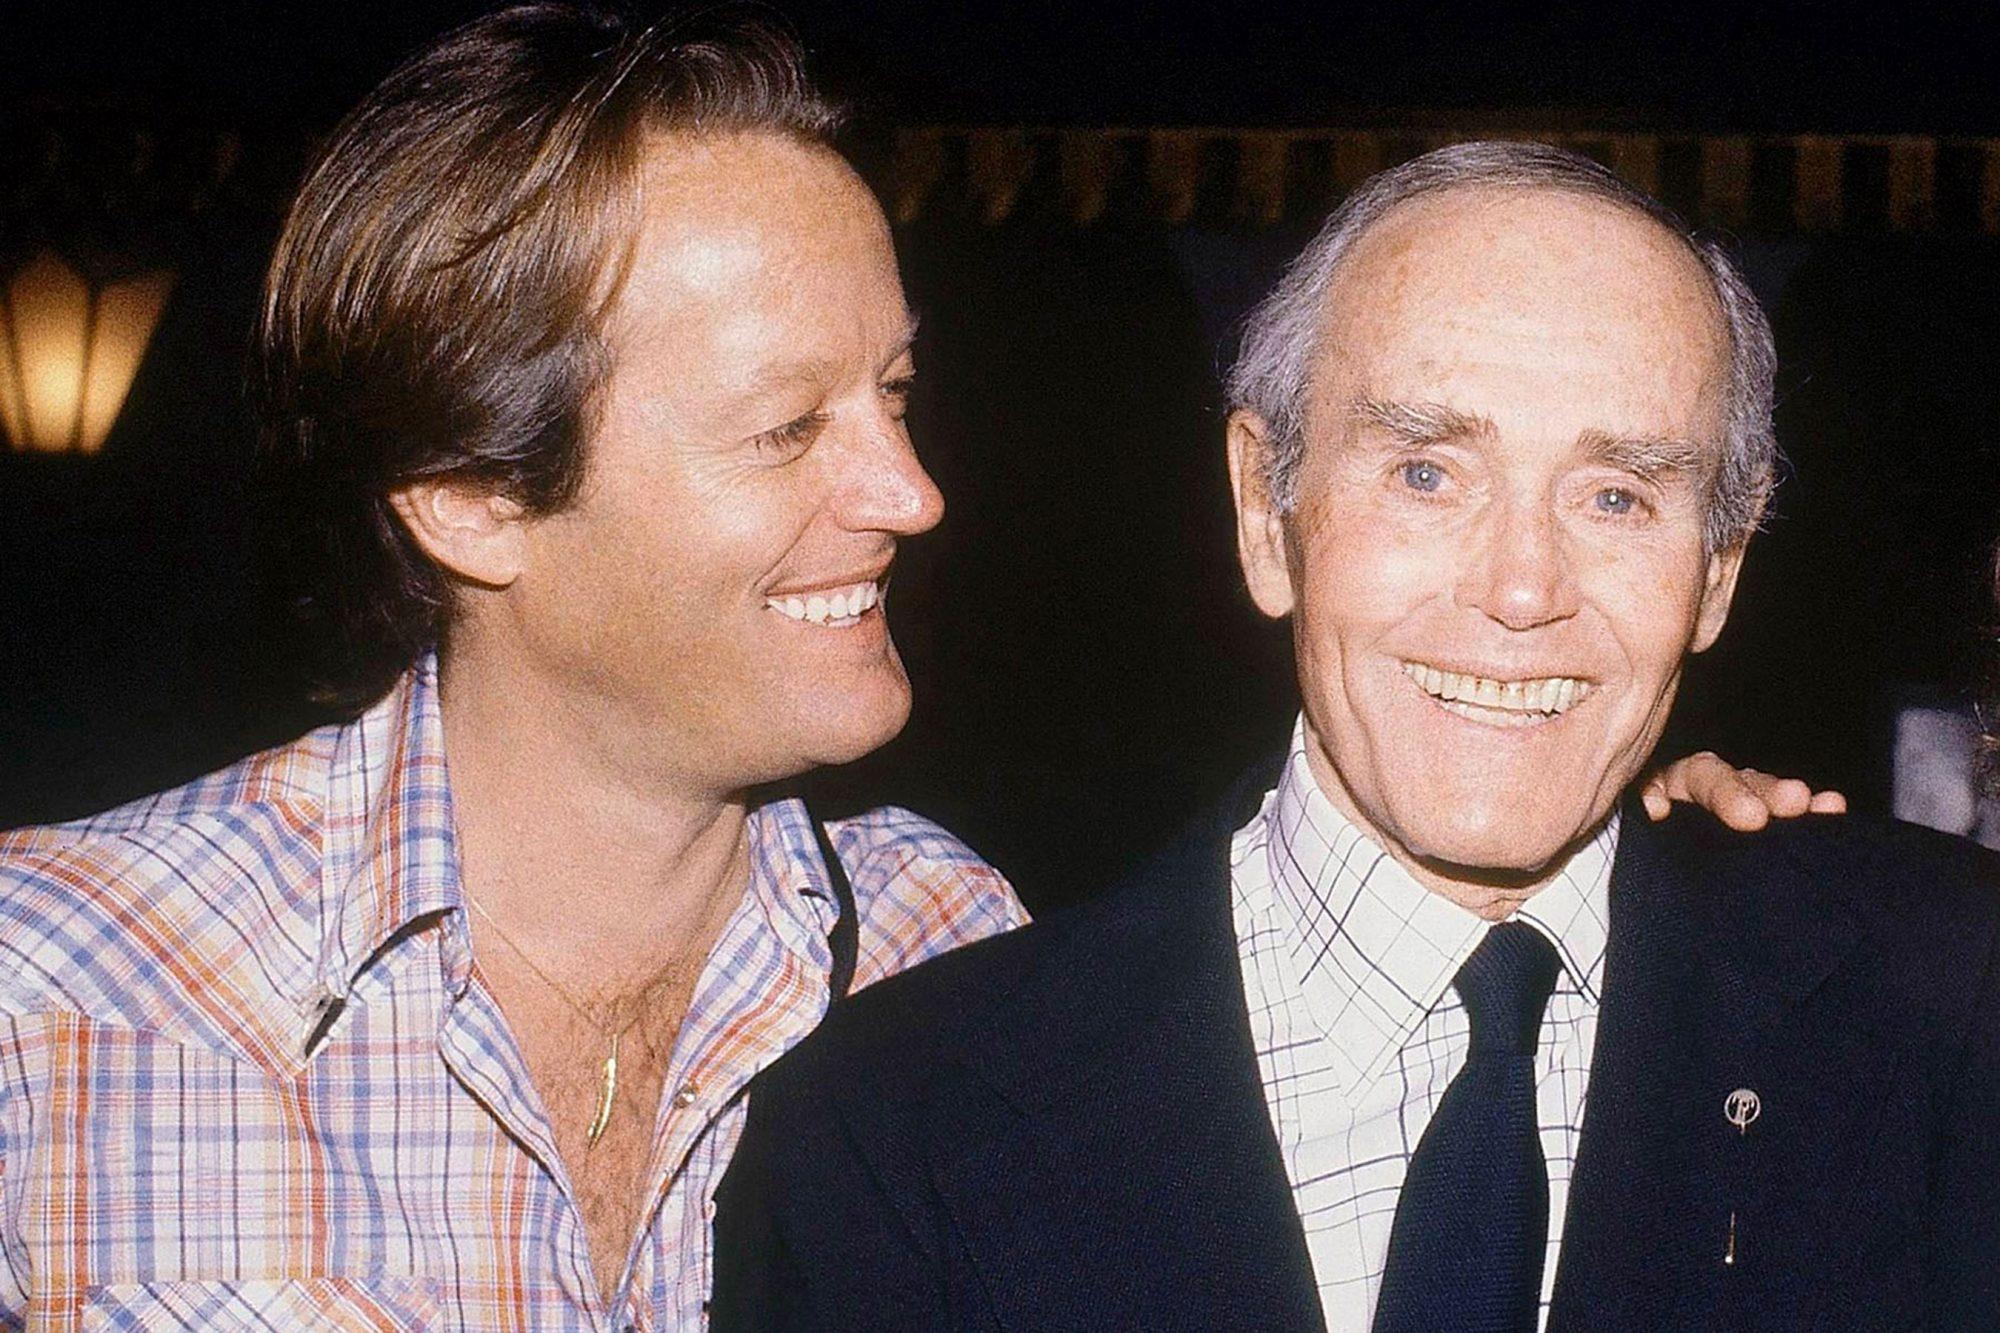 Henry Fonda, LOS ANGELES, USA